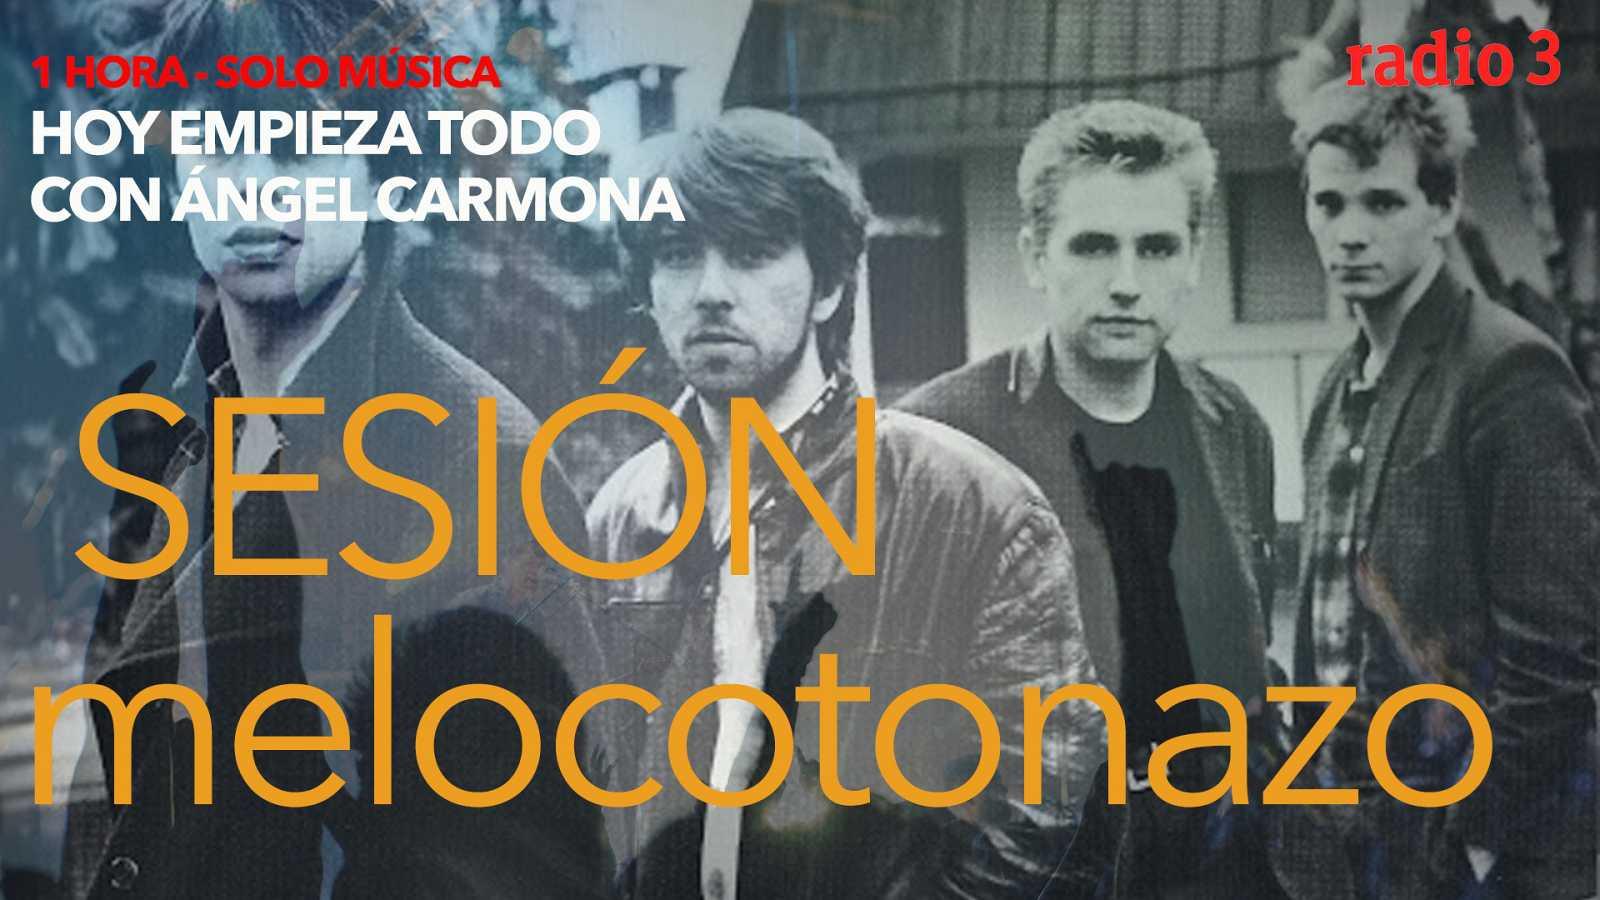 Hoy empieza todo con Ángel Carmona - #SesiónMelocotonazo: Echo & The Bunnymen, Radio Futura, Veps... - 05/05/21 - escuchar ahora